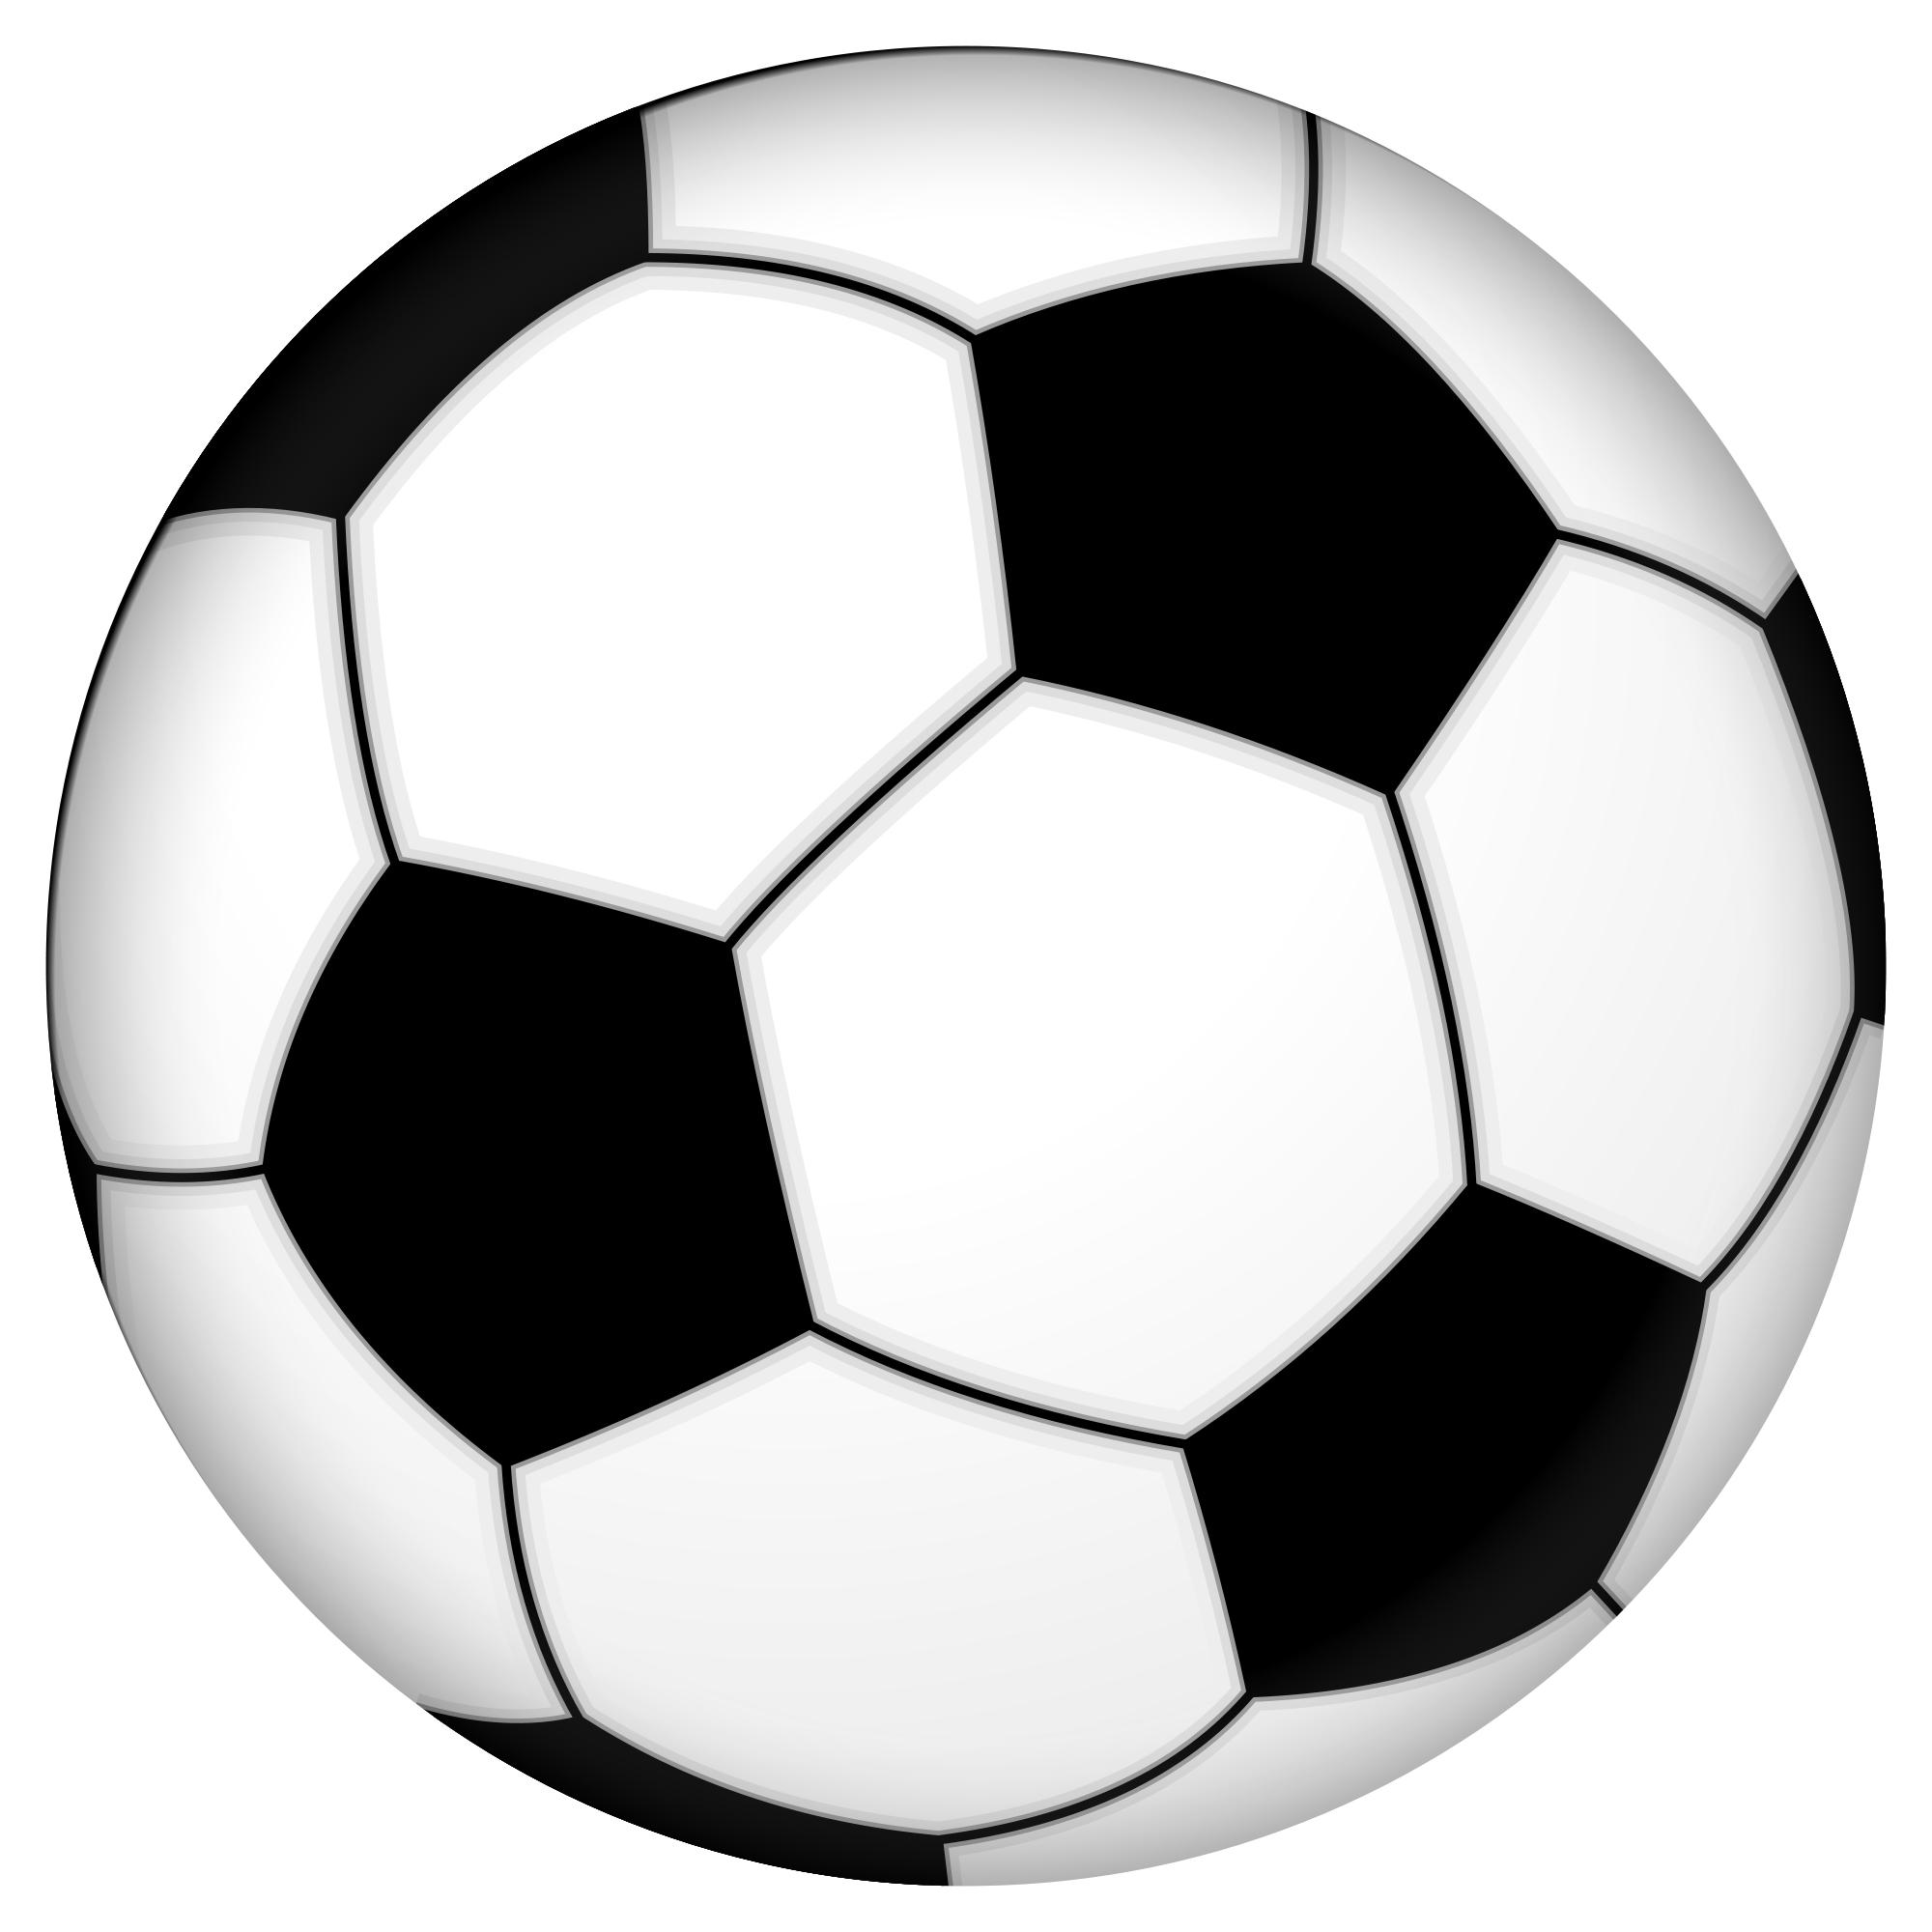 Kicking Soccer Ball Clip Art Clipart Pan-Kicking Soccer Ball Clip Art Clipart Panda Free Clipart Images-9